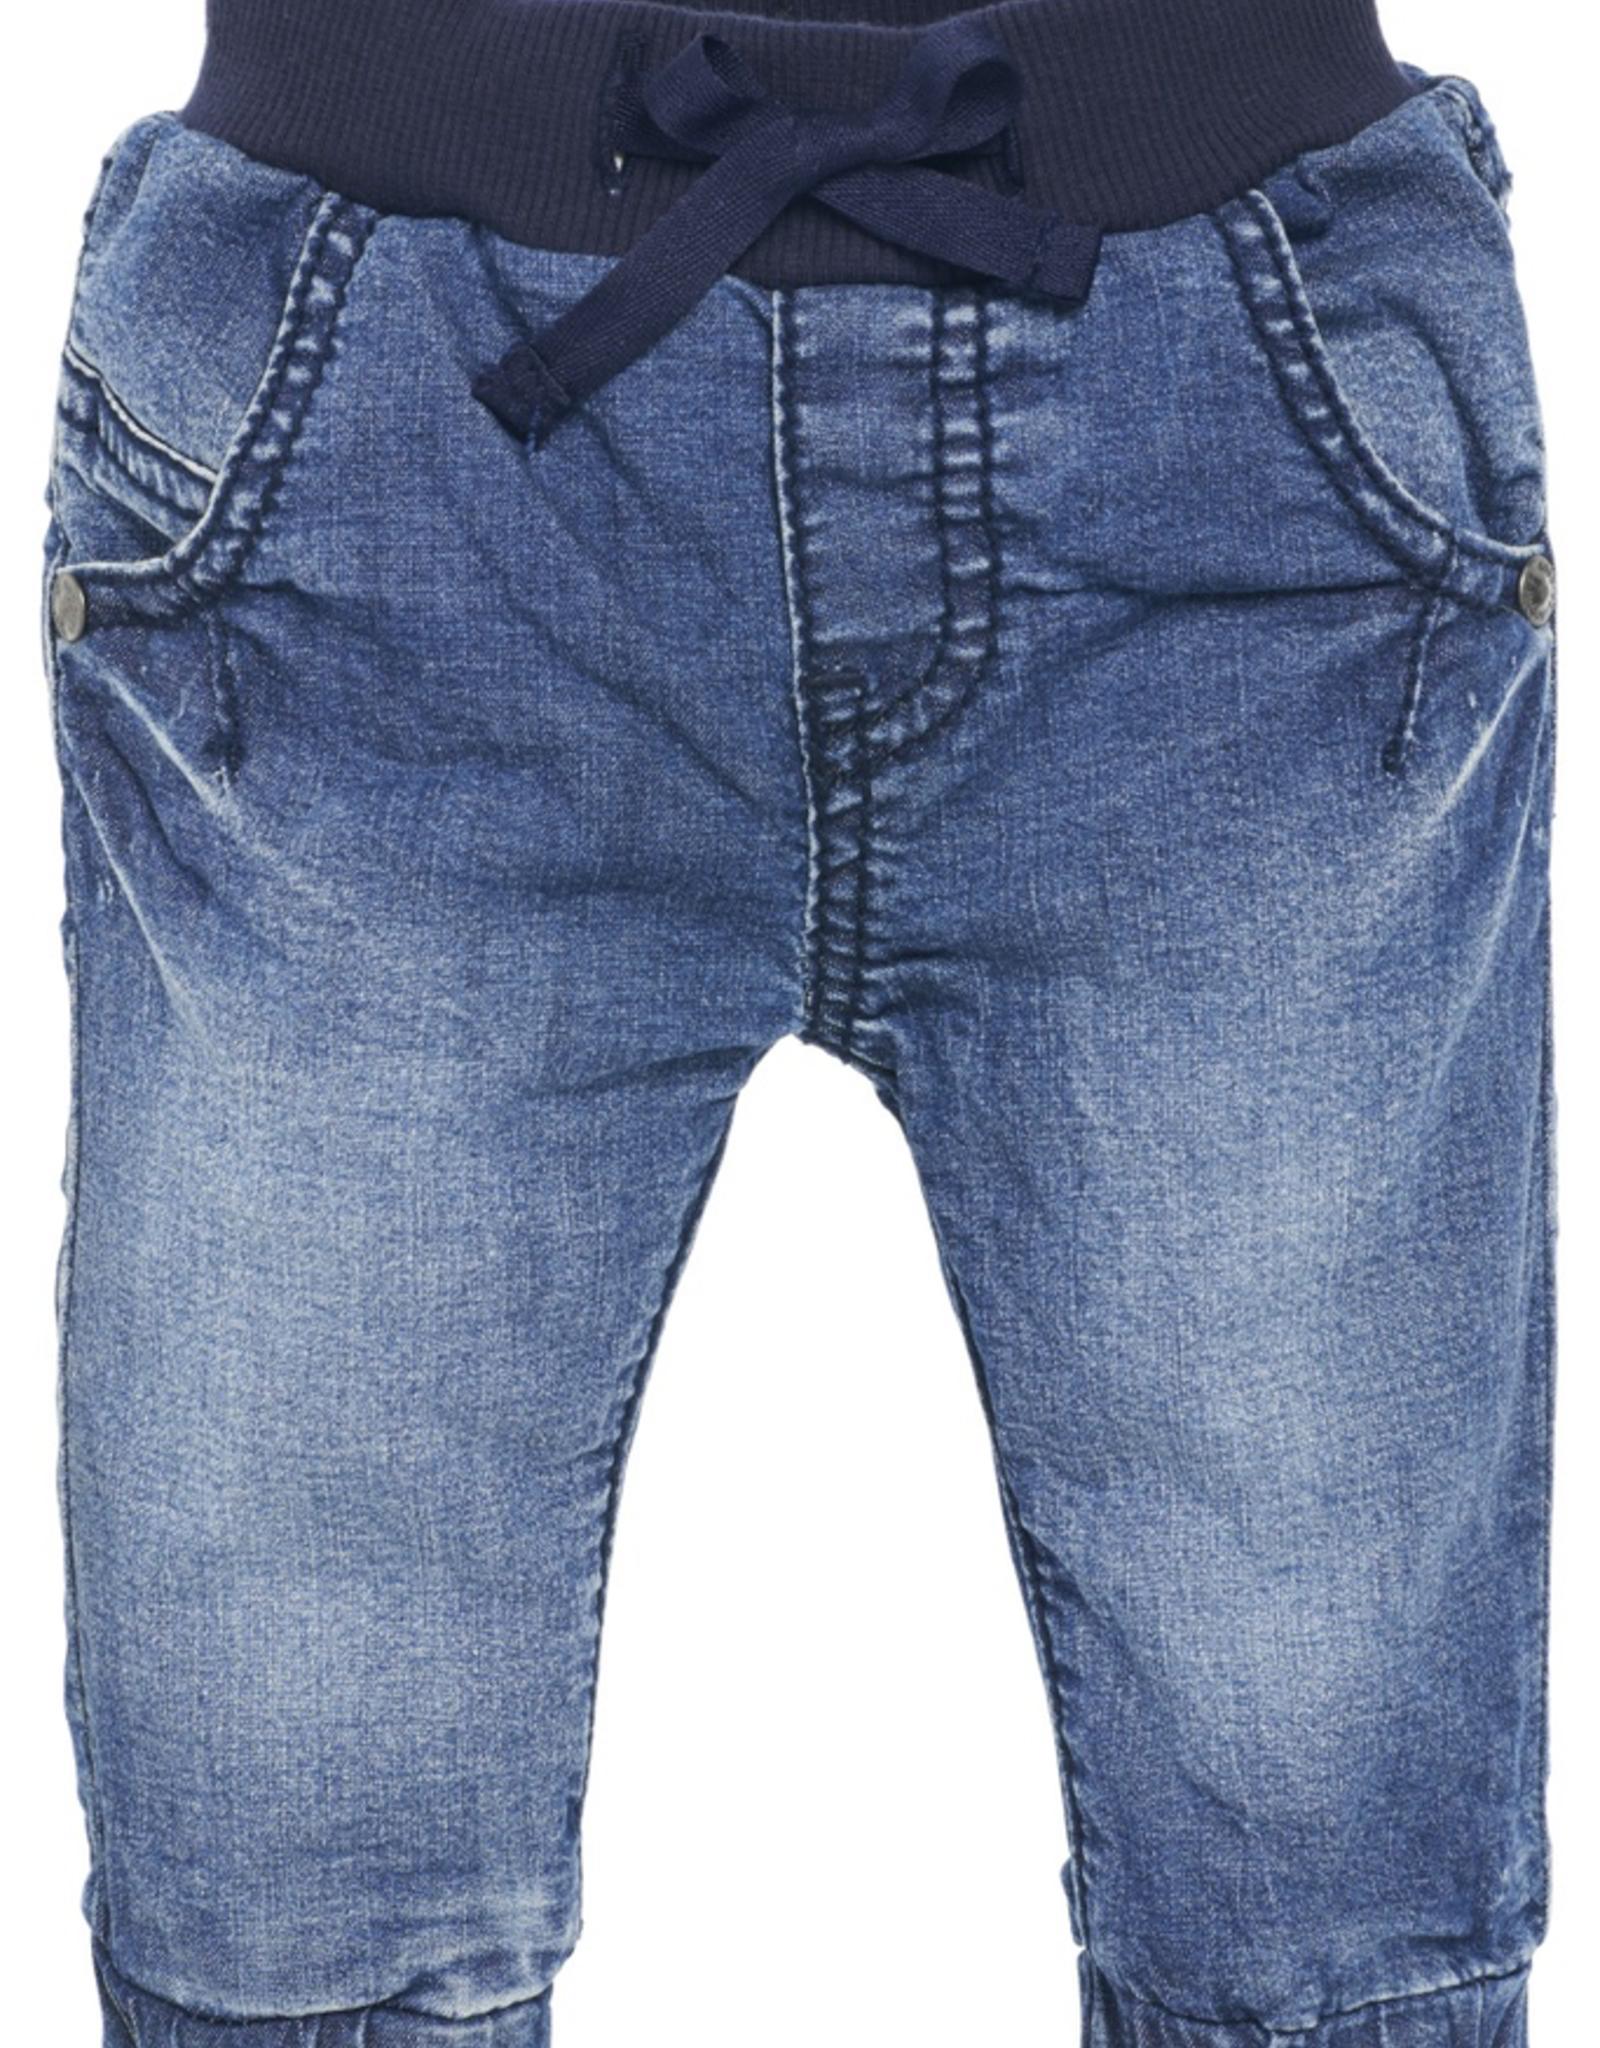 Noppies Kids Unisex Comfort Jeans for Baby